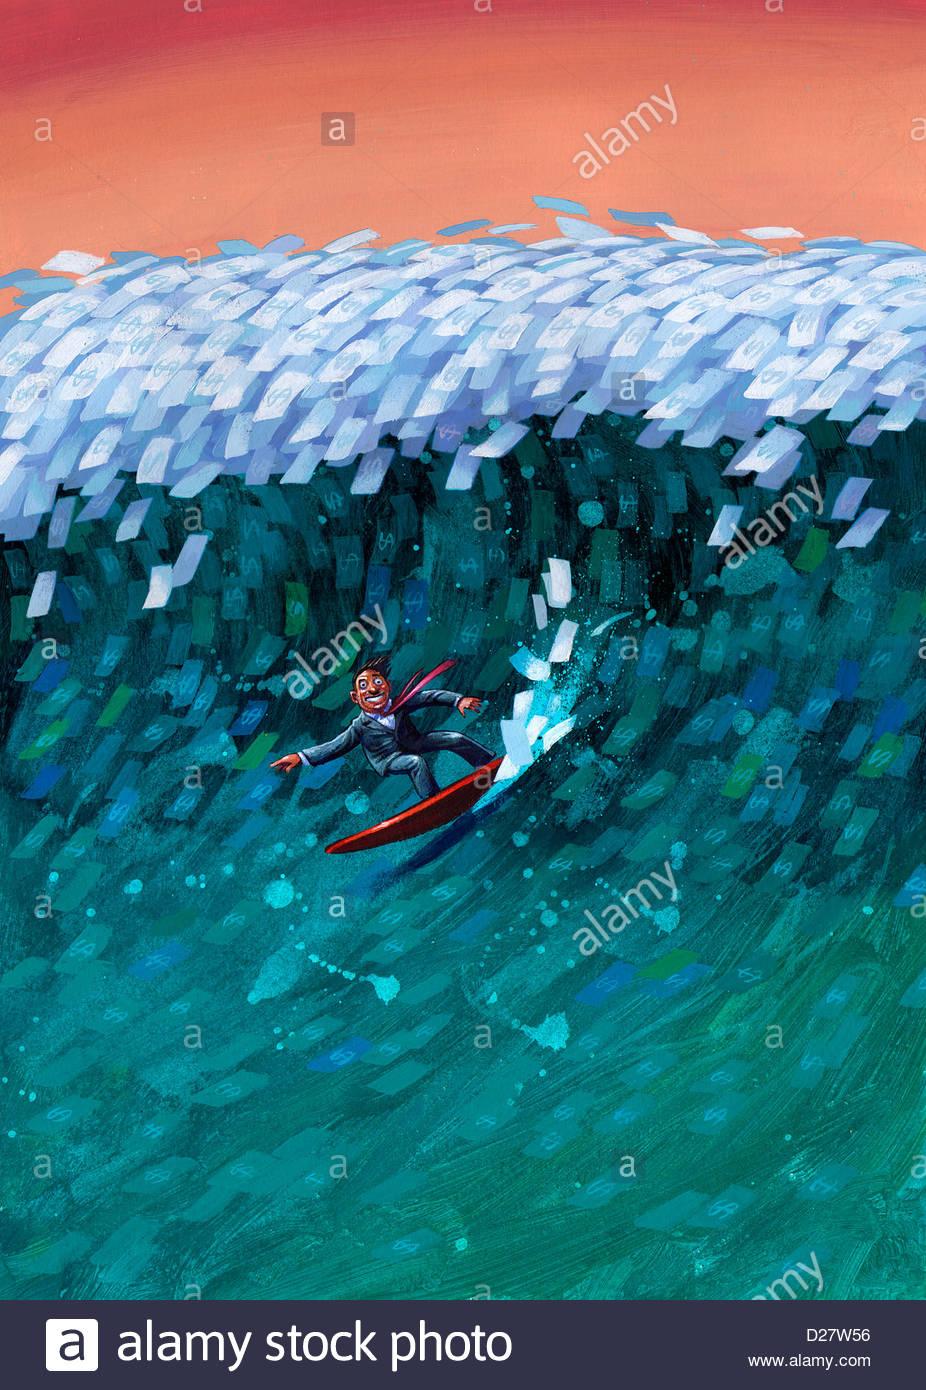 Businessman surfing on money wave - Stock Image